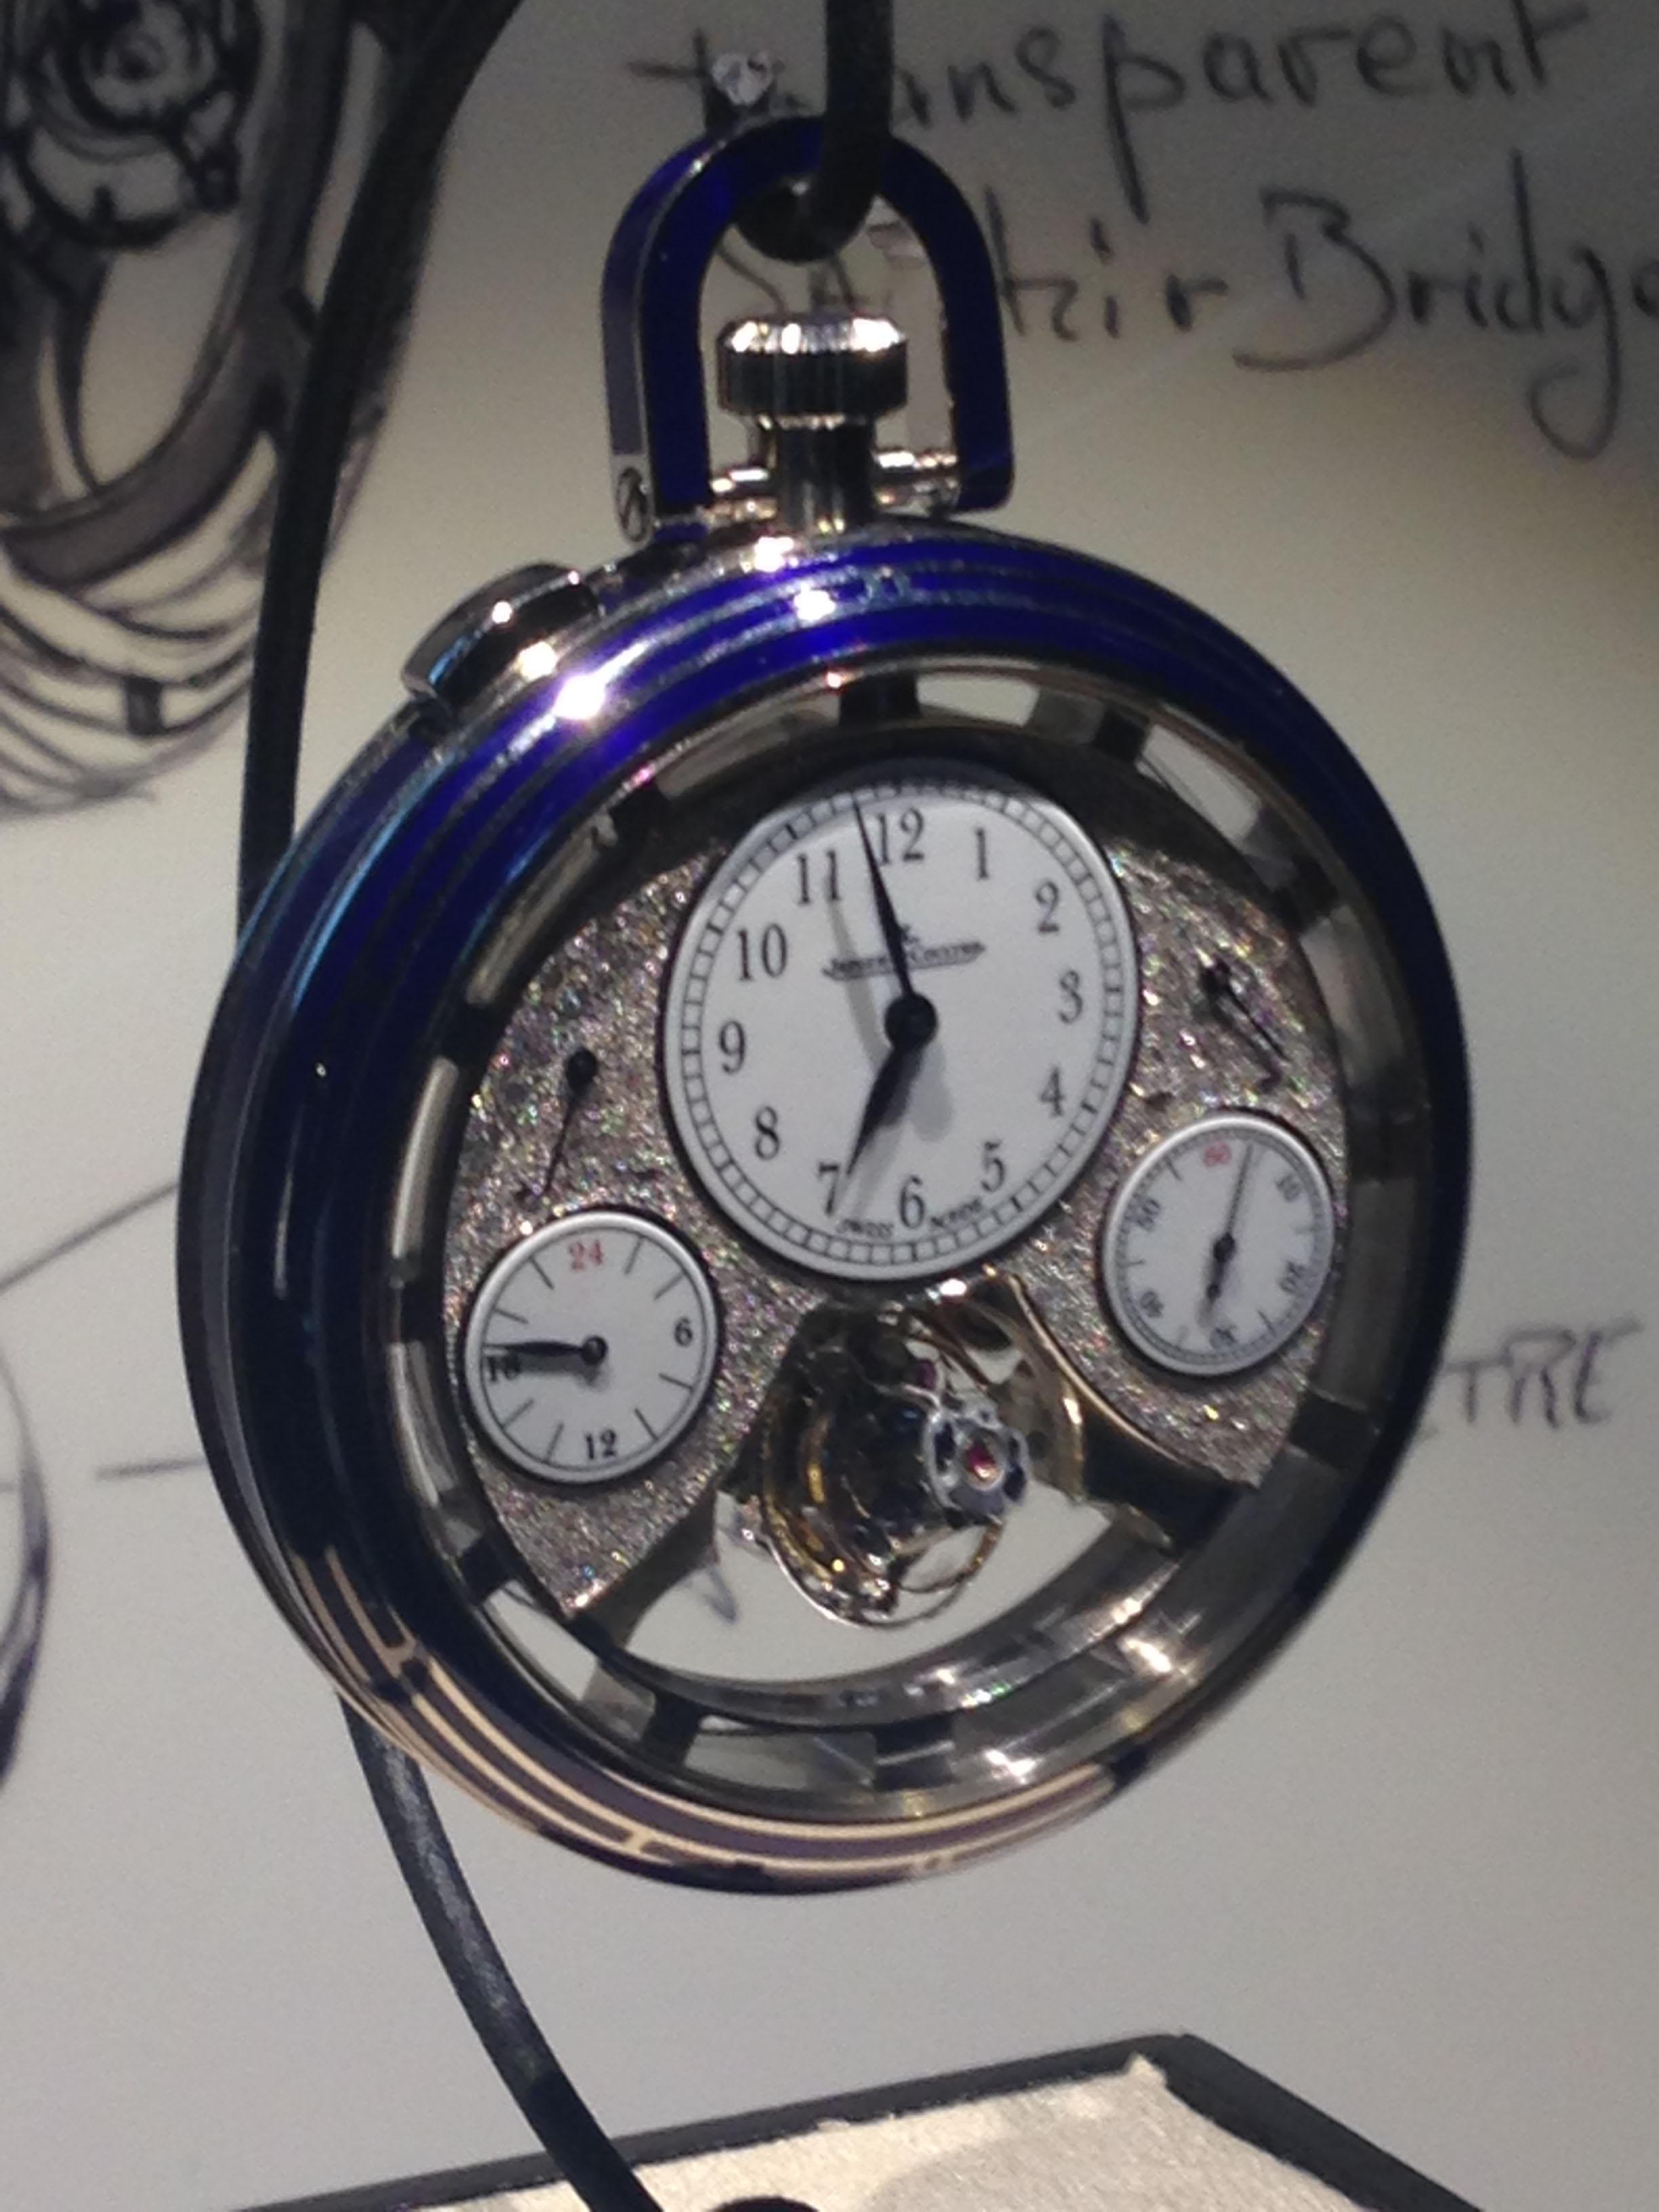 Jaeger-LeCoultre Hybris Artistica Duometre Spherotourbillon Pocket watch